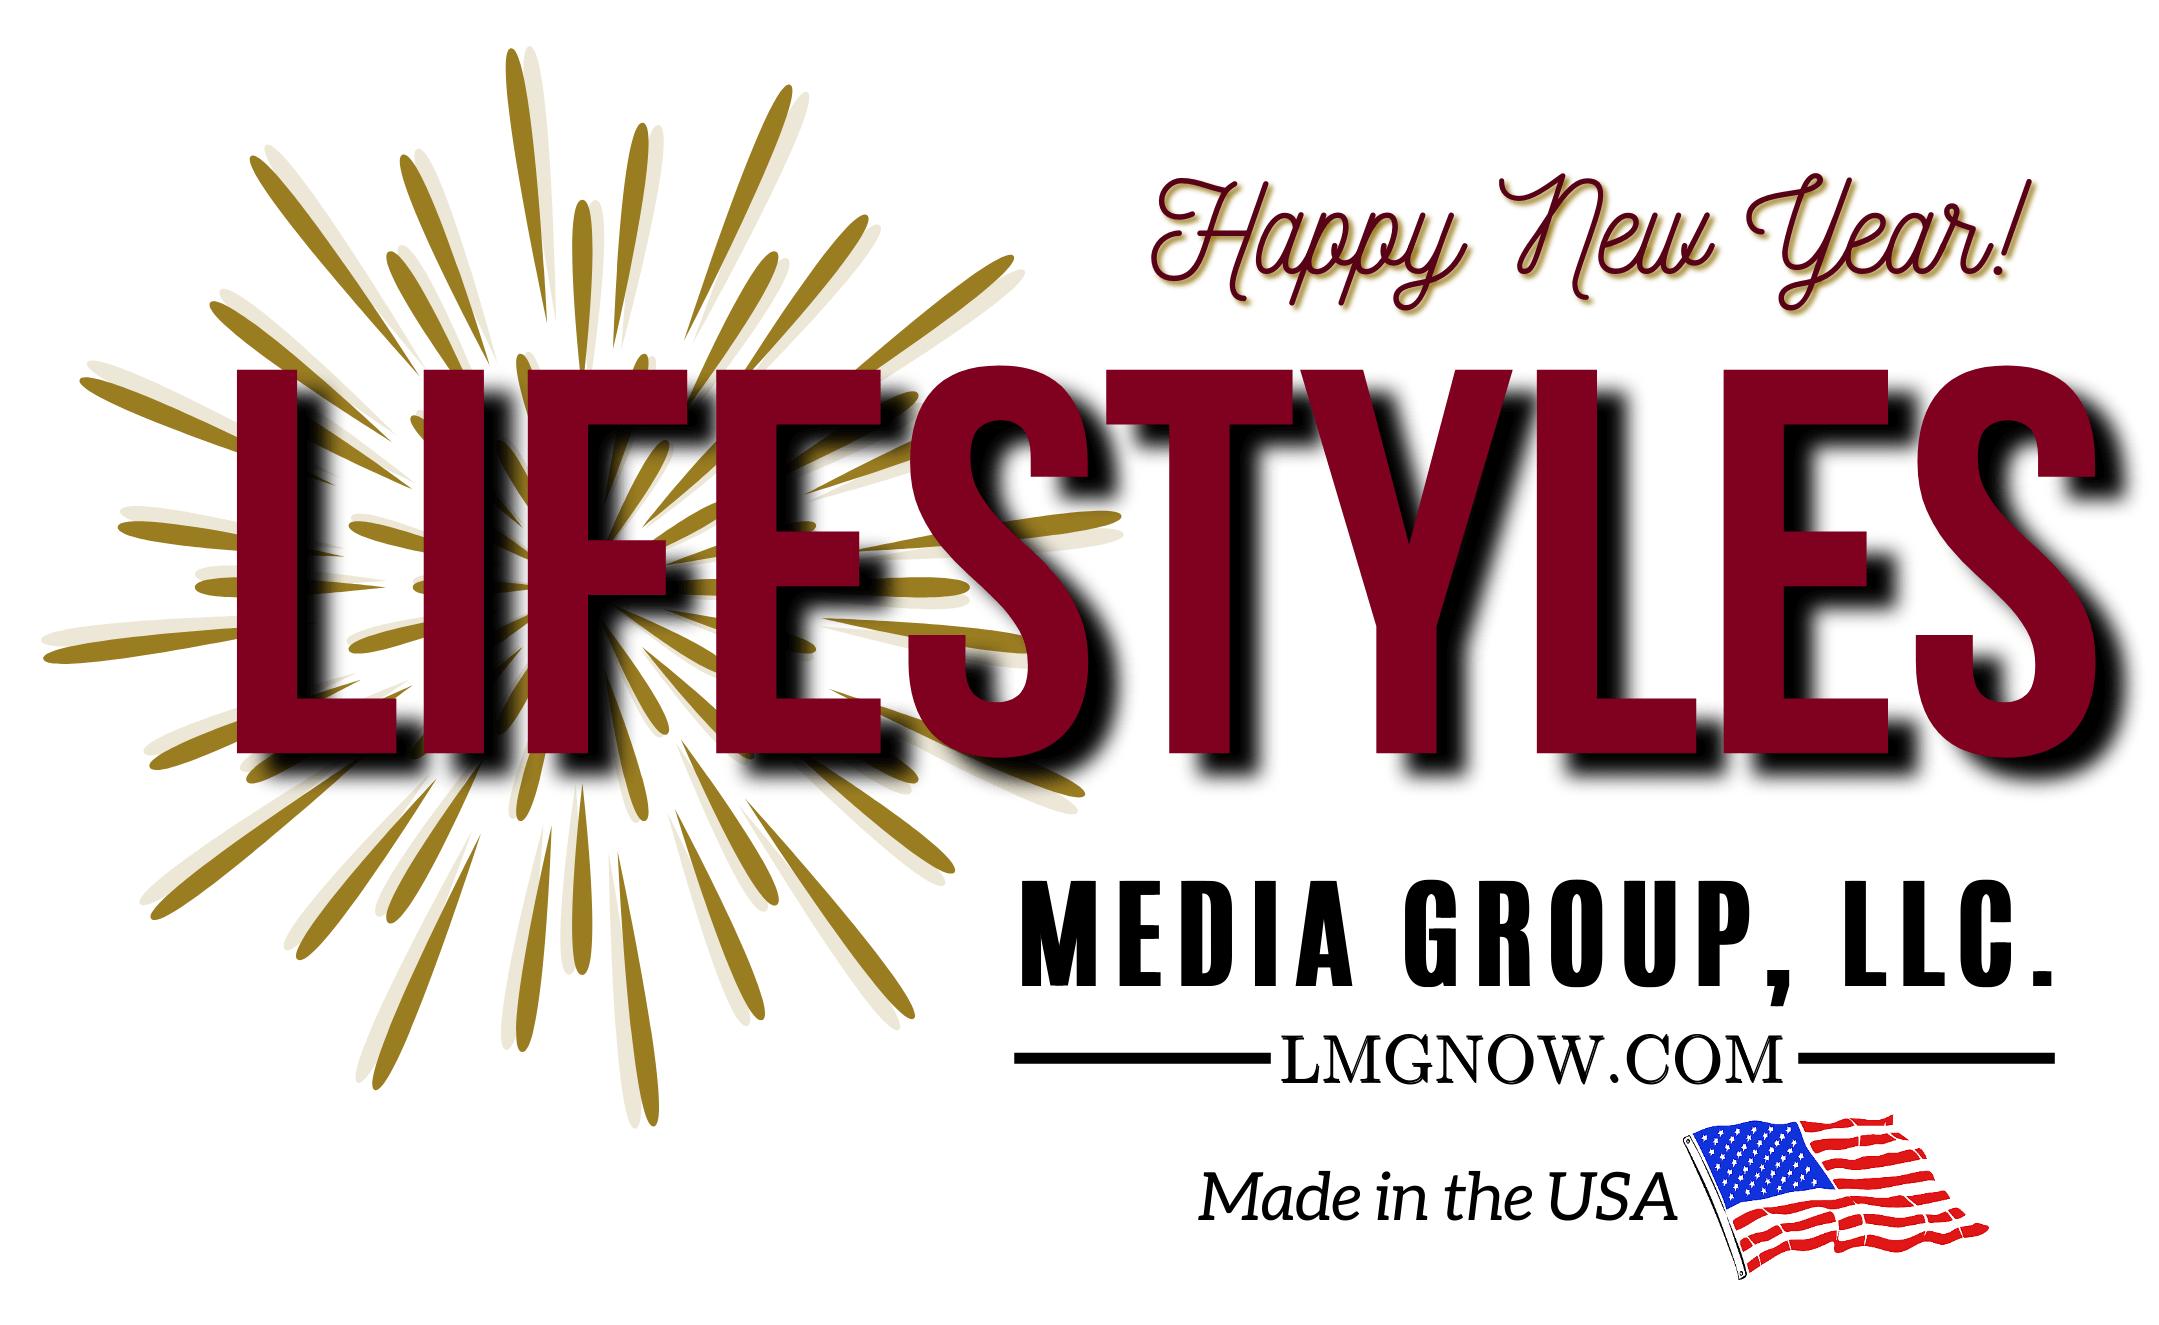 Lifestyles Media Group, LLC.